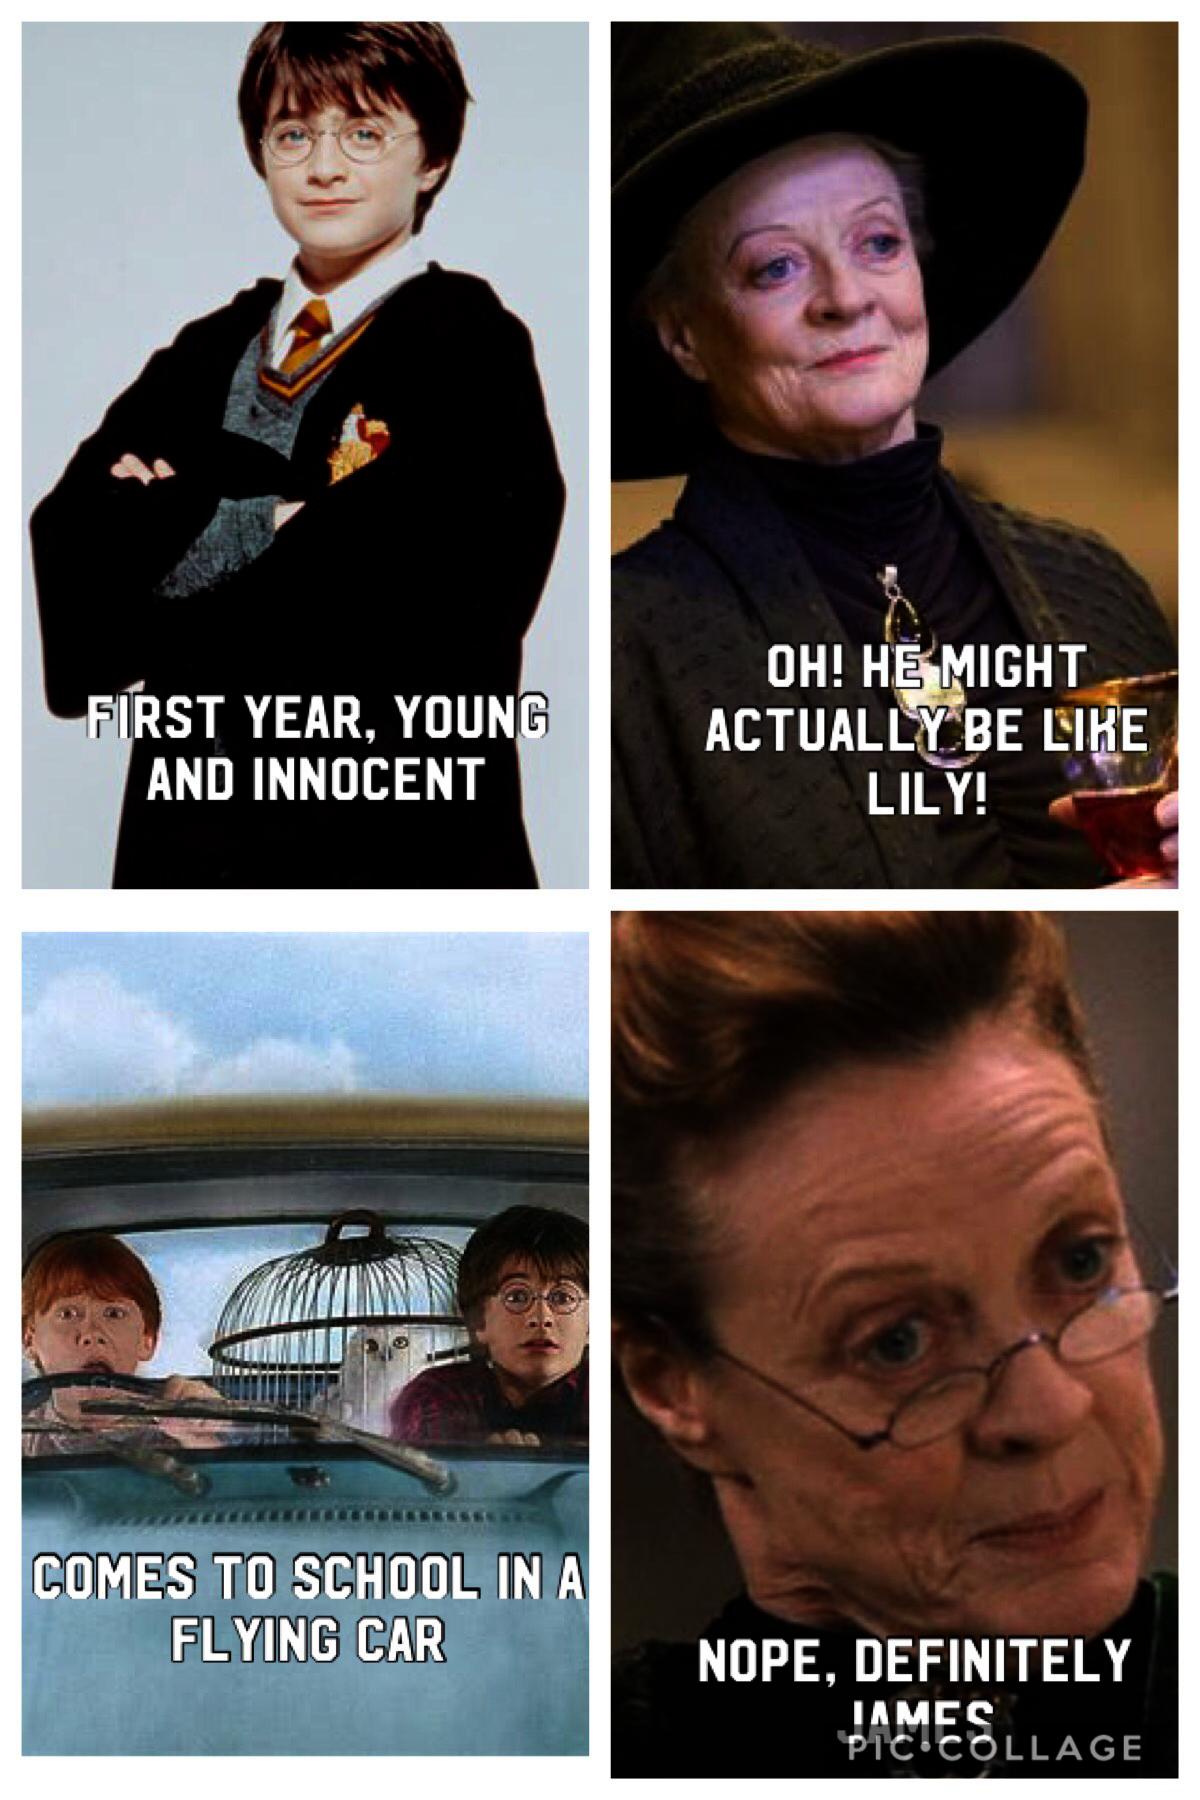 Harry Potter Nerd Memes Without Harry Potter Cast Lockhart Harry Potter World Discount Across Harr Harry Potter Universal Harry Potter Puns Harry Potter Memes